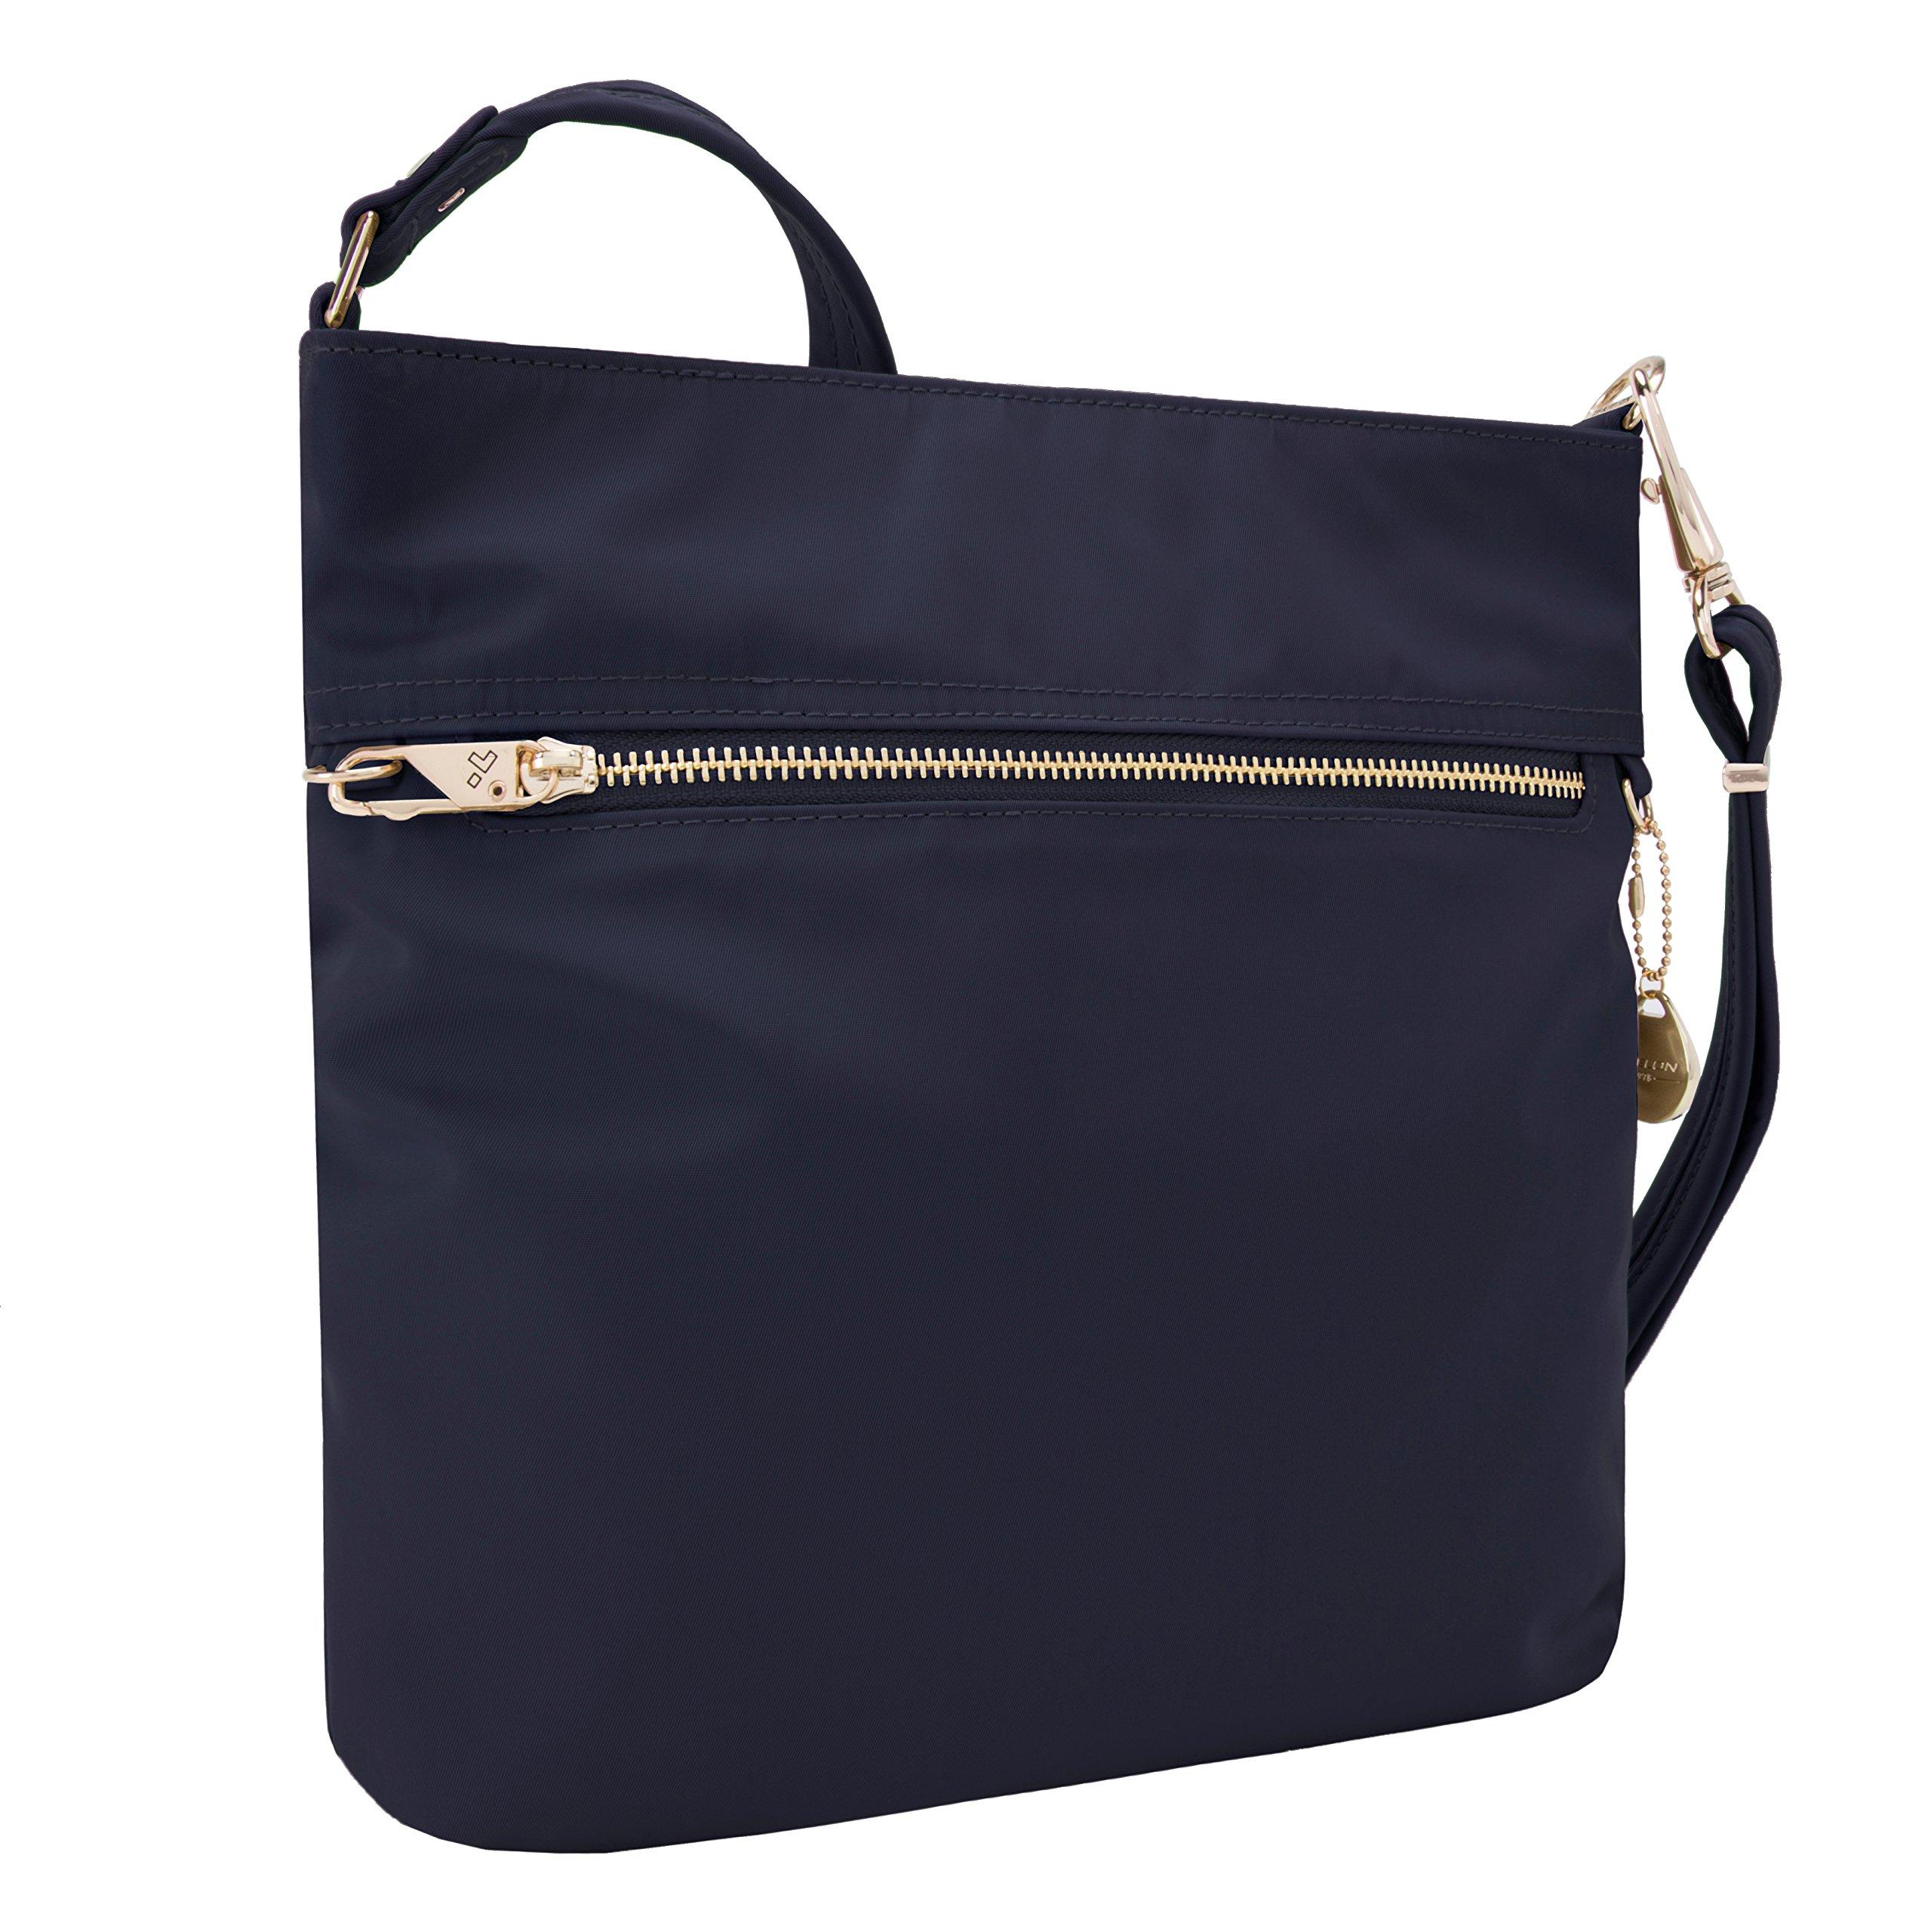 Travelon Women's Anti-Theft Tailored N/s Slim Bag Cross Body, Sapphire One Size